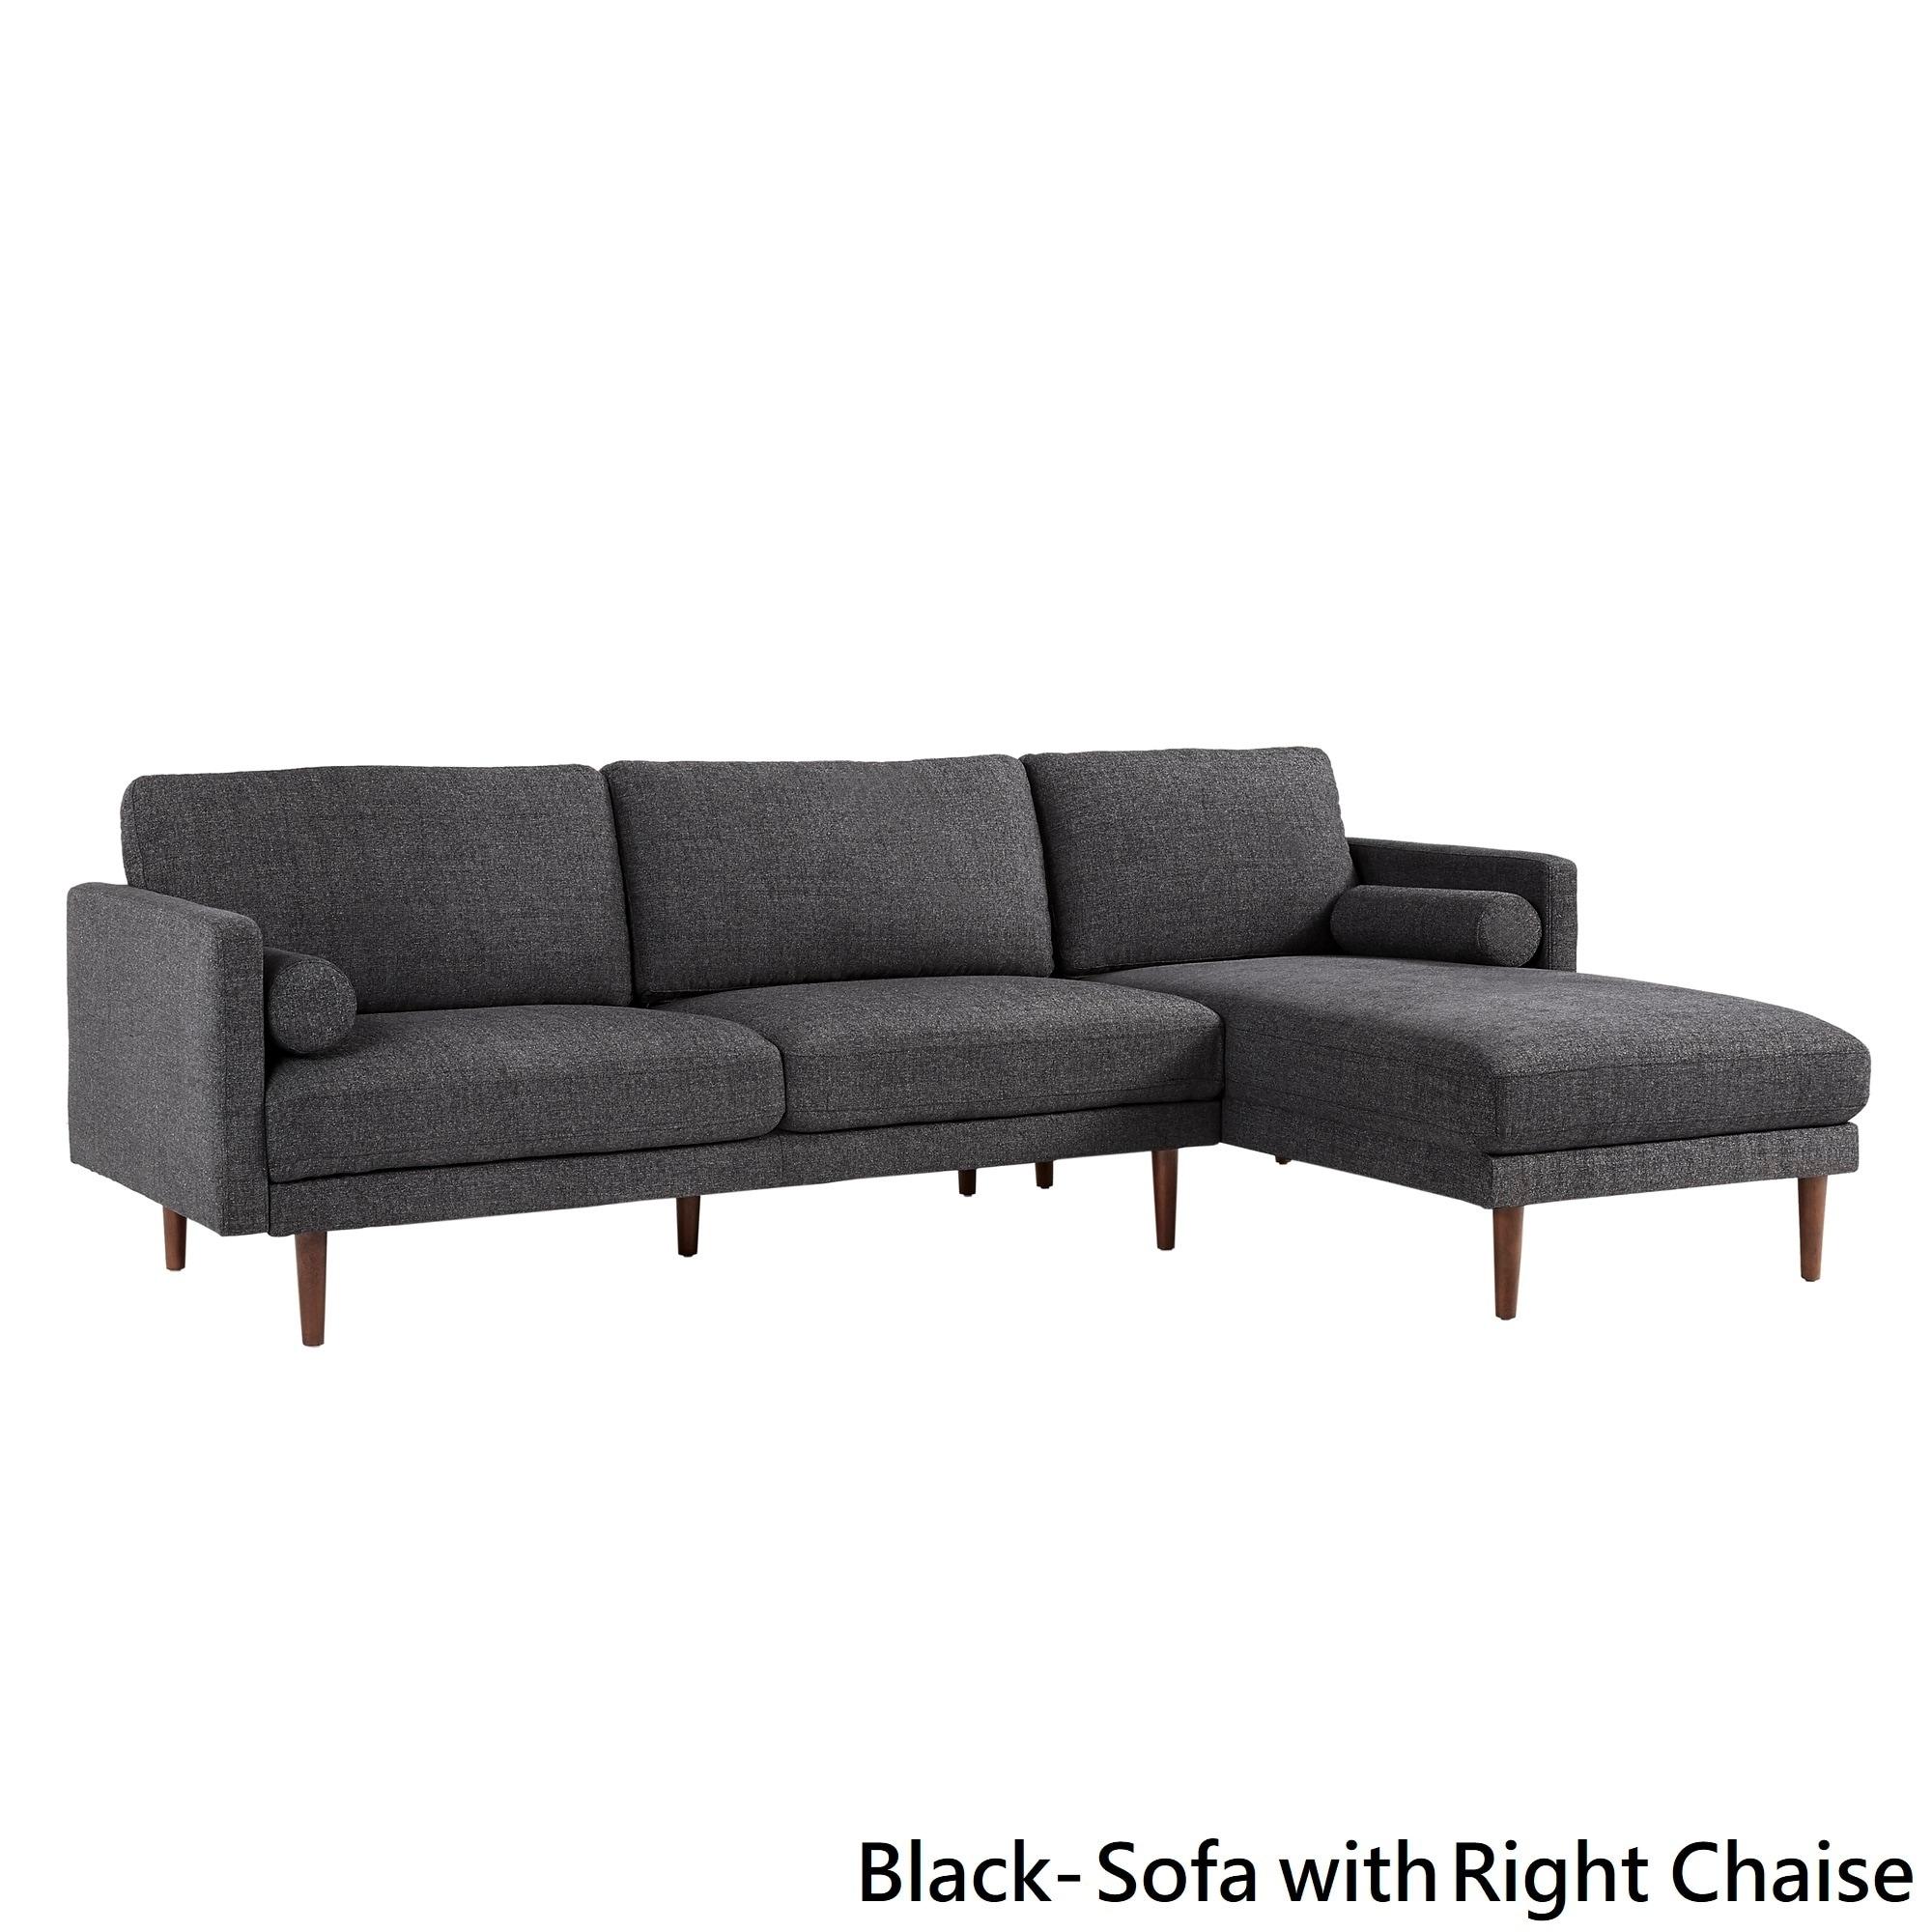 Carson Carrington Hjarpasen Rubberwood Sectional Sofa